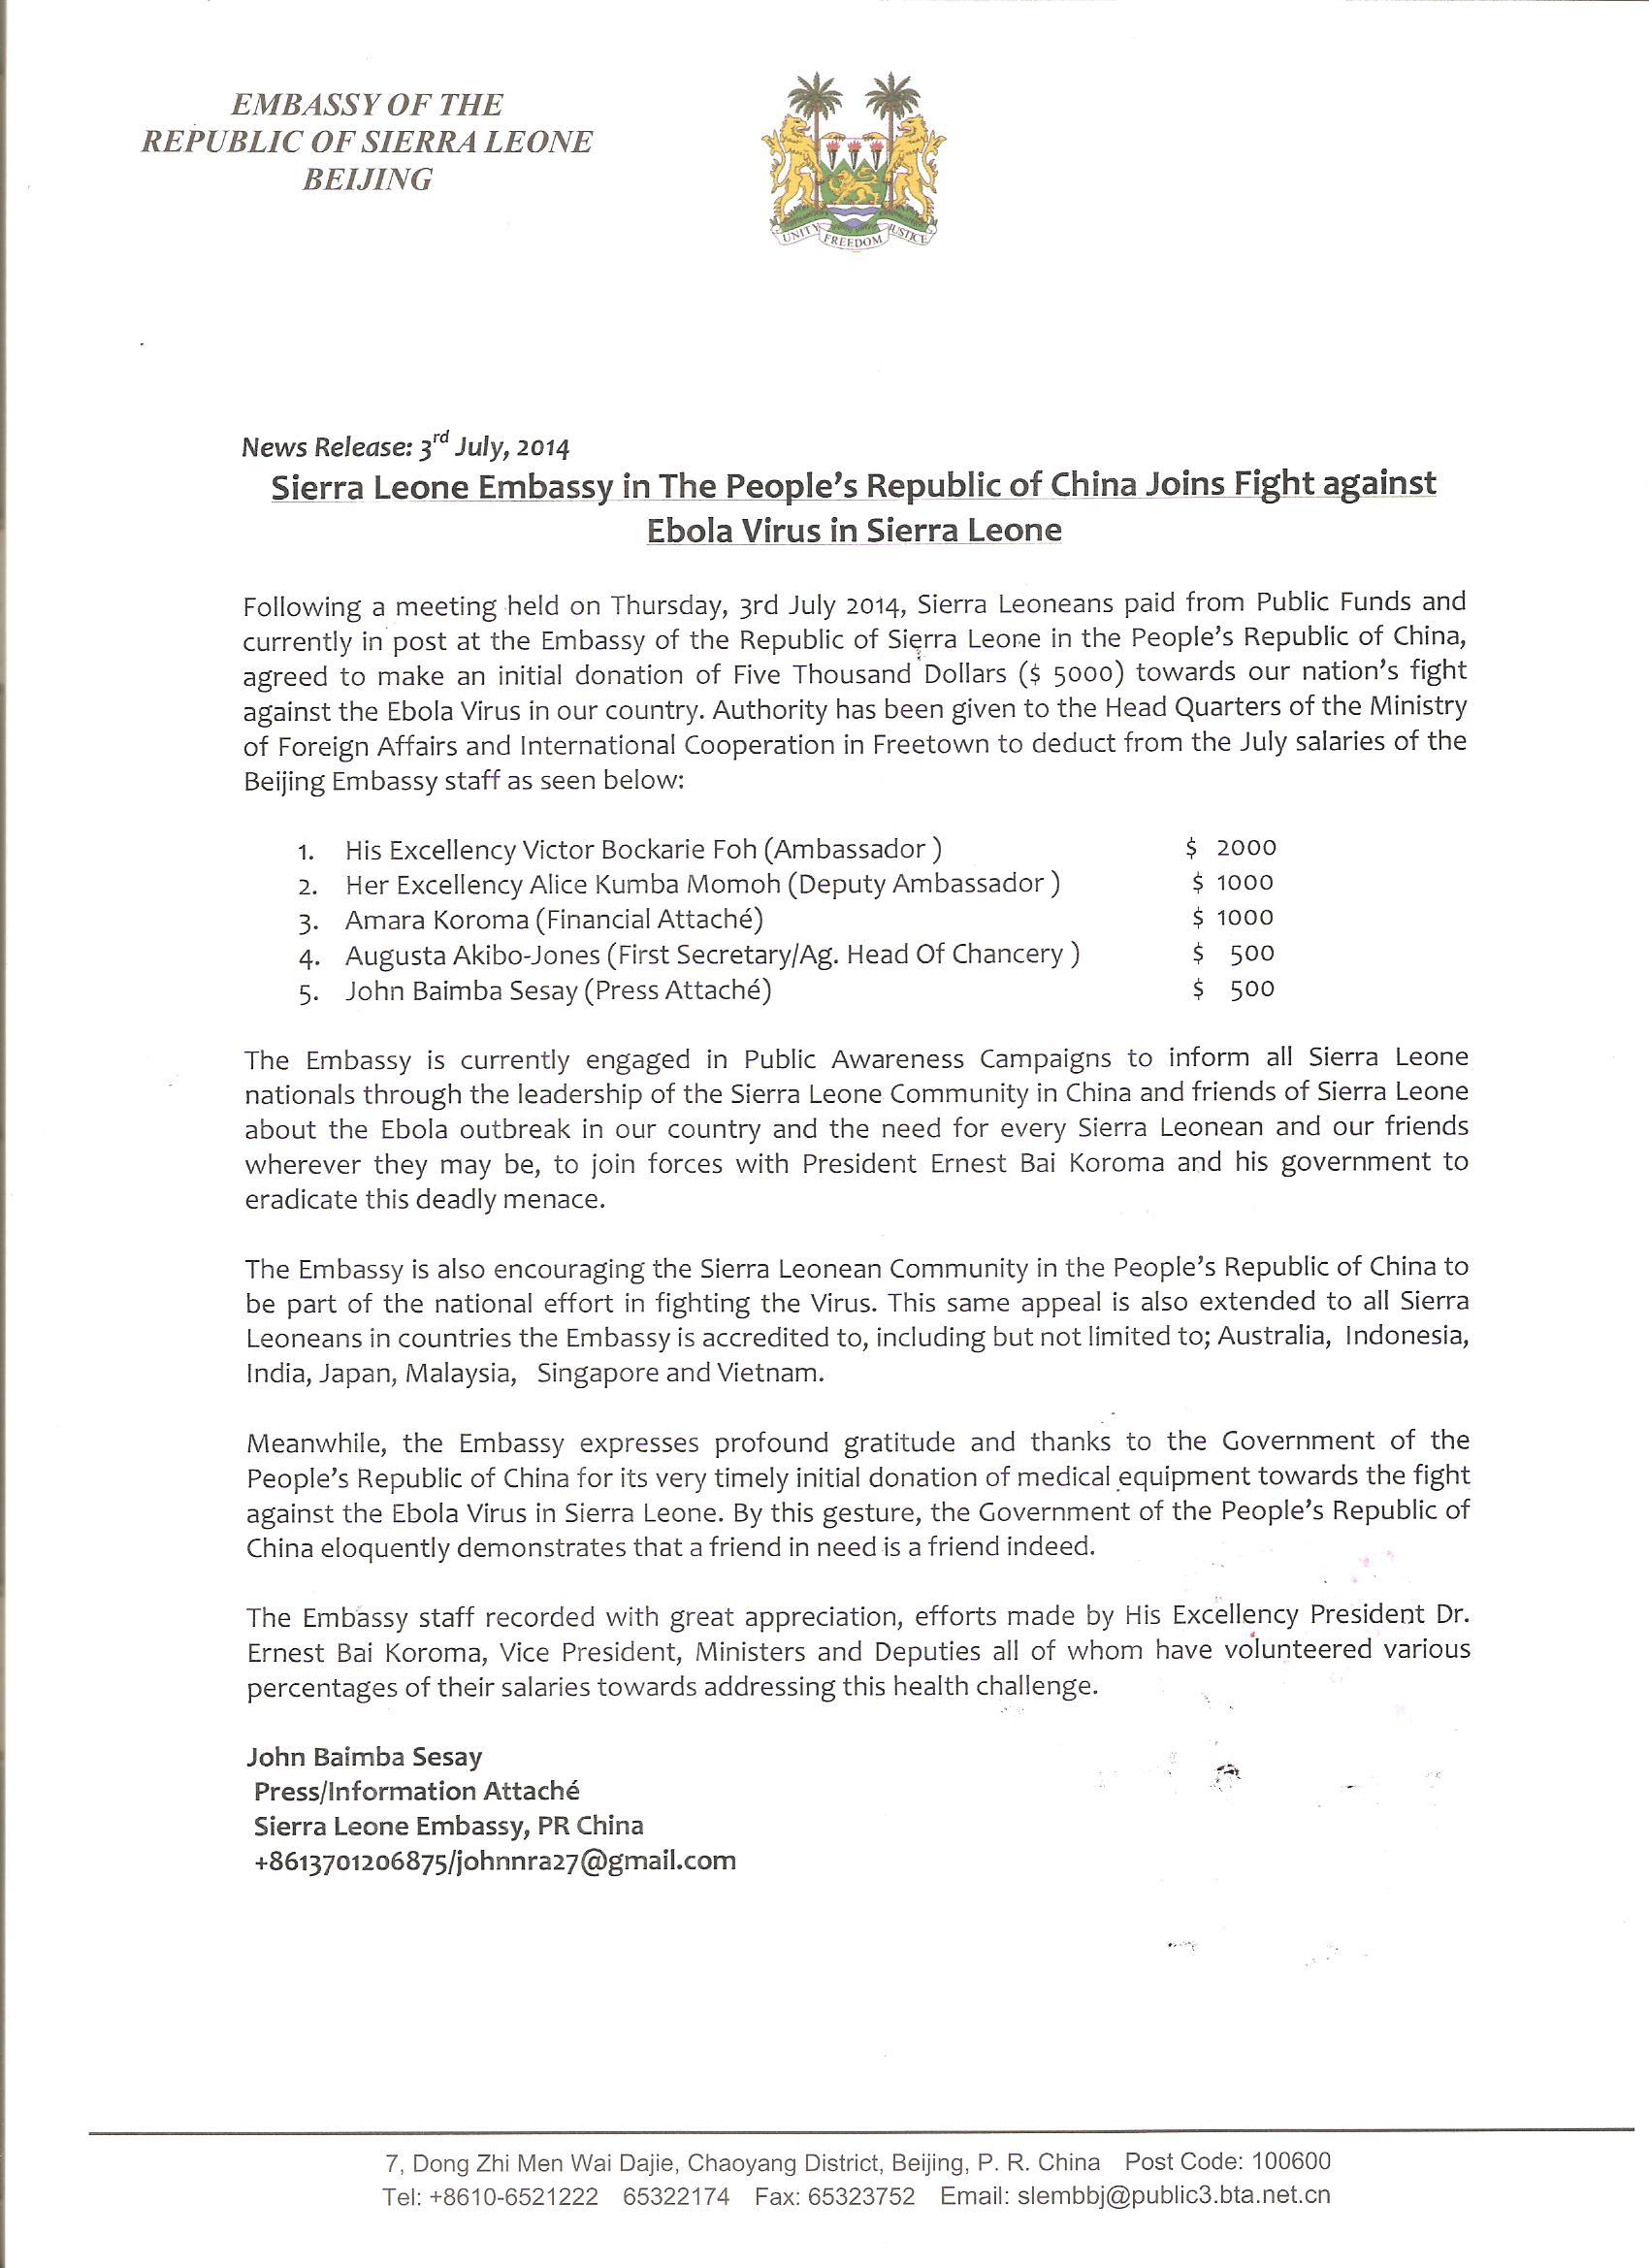 Fight against Ebola Virus in Sierra Leone